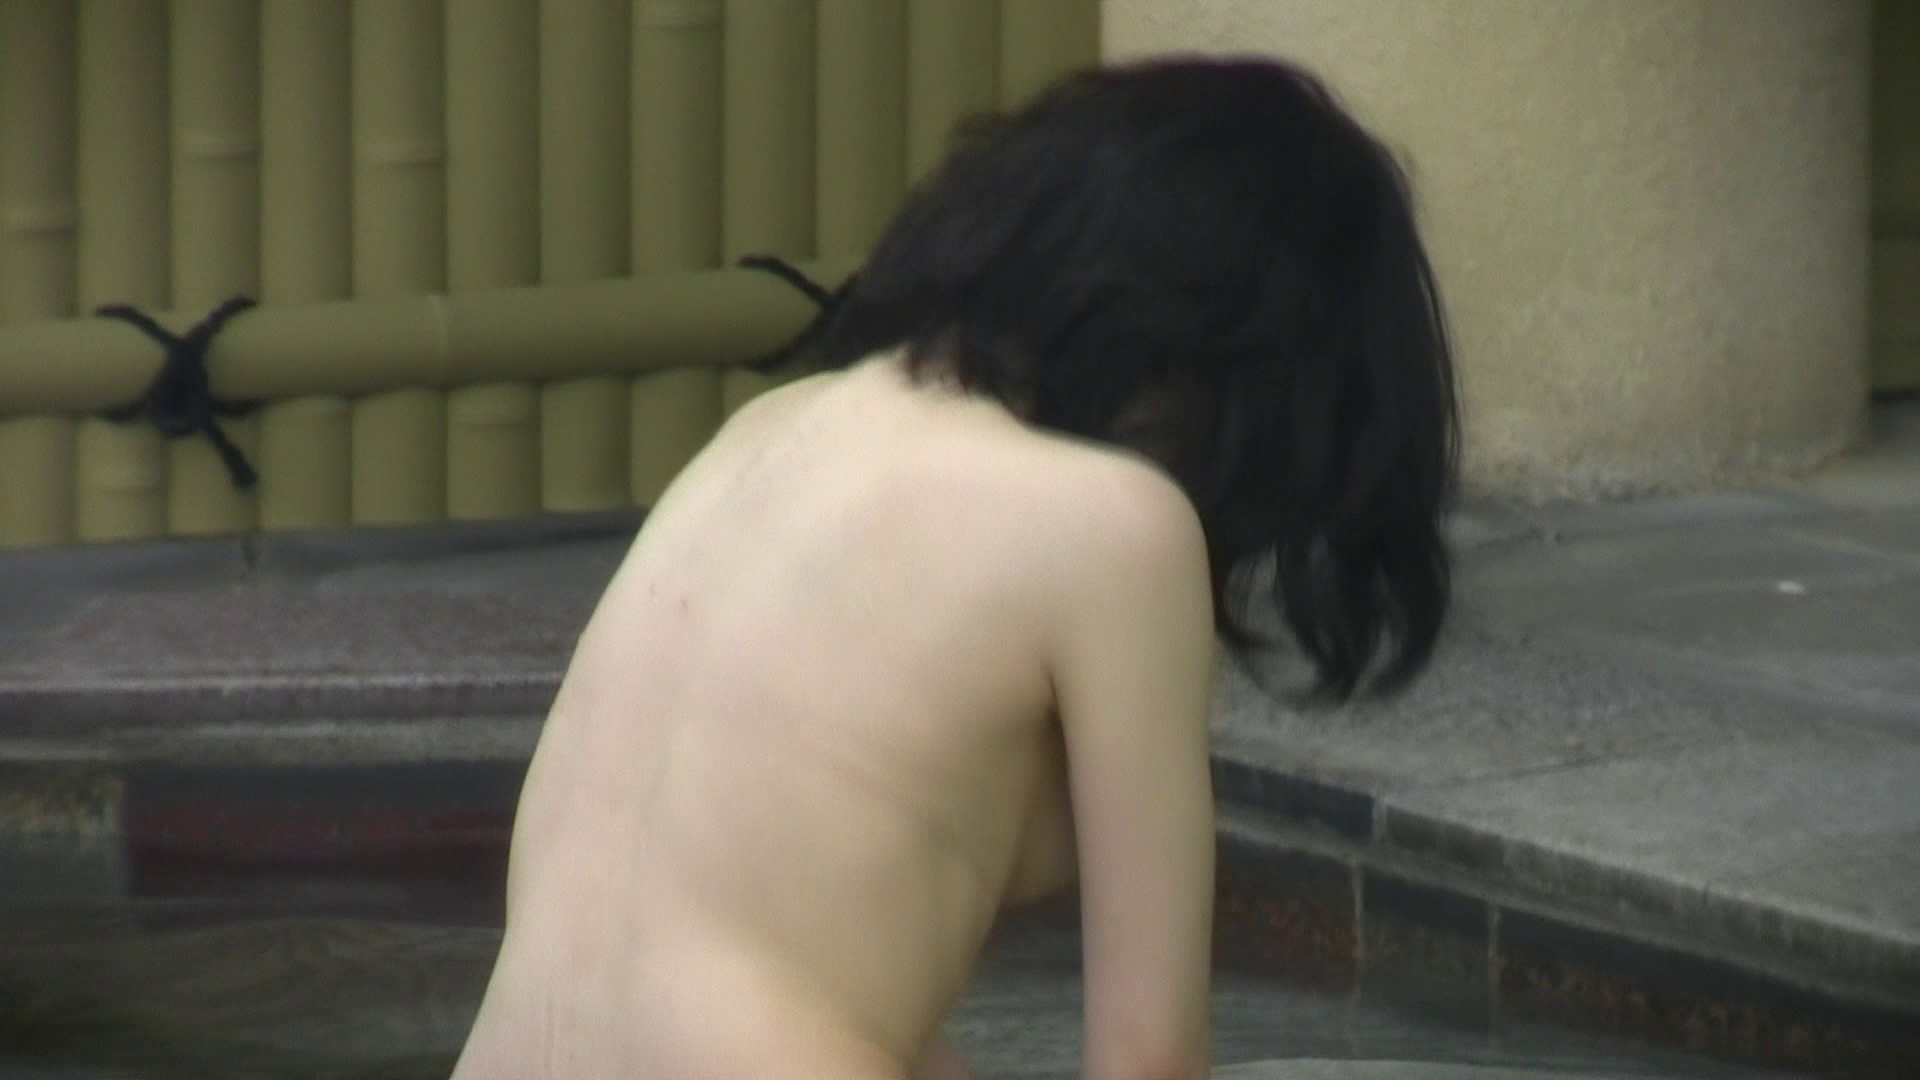 Aquaな露天風呂Vol.681 盗撮シリーズ   露天風呂編  94PIX 43